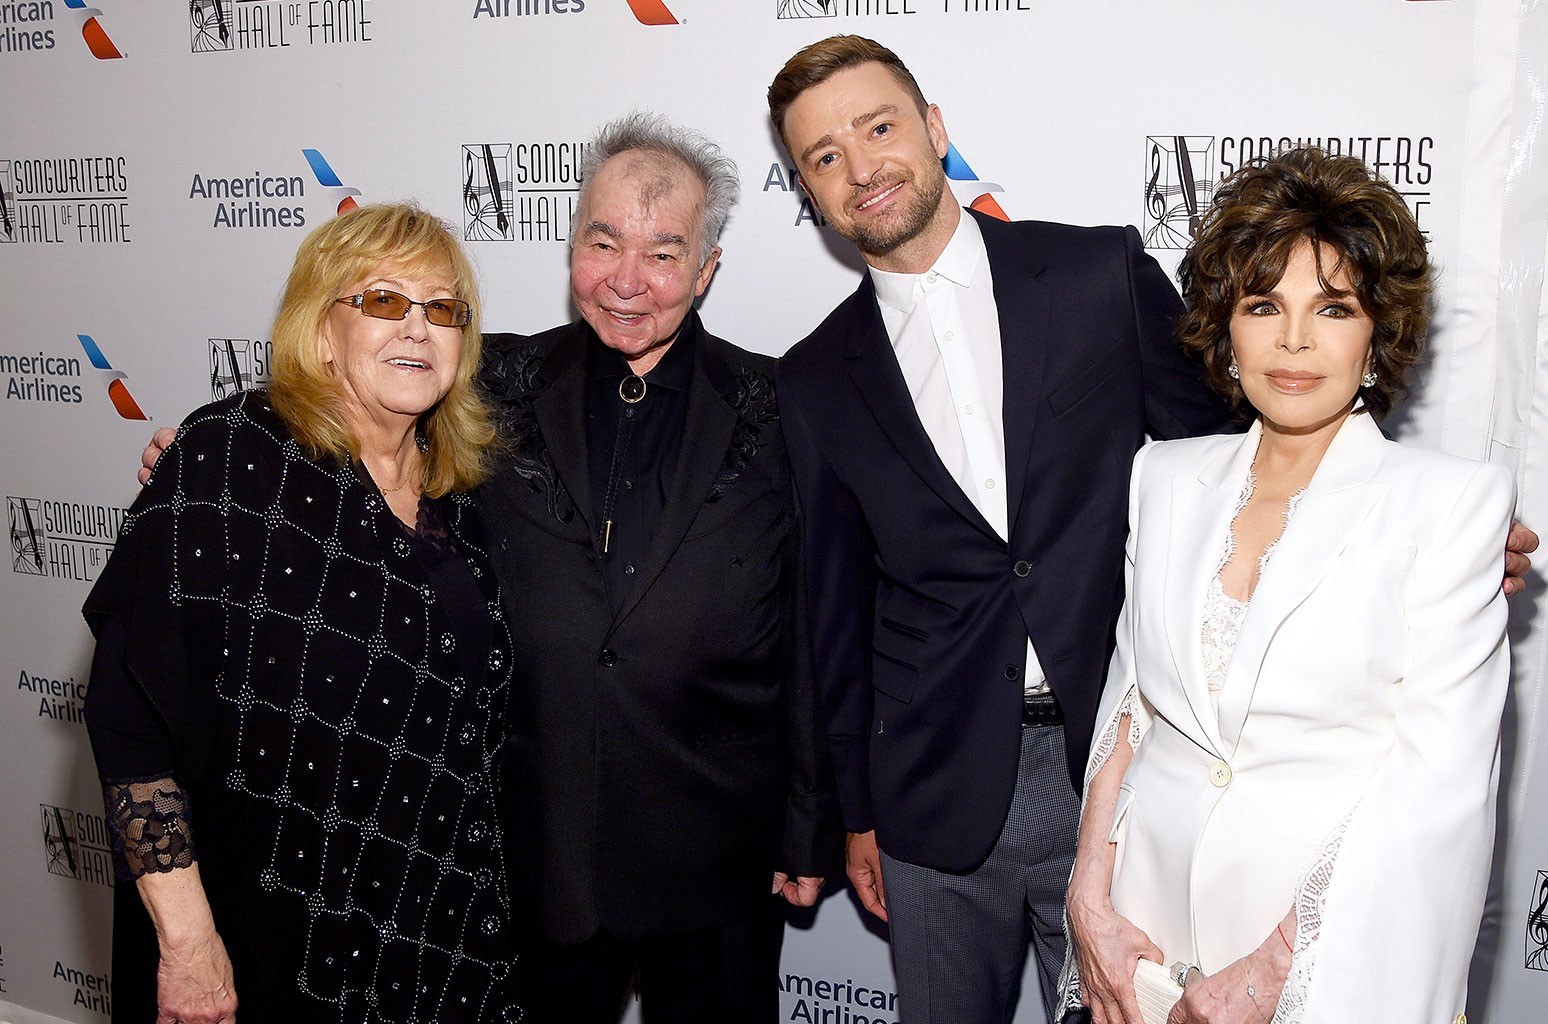 Linda Moran, John Prine, Justin Timberlake and Carole Bayer Sager